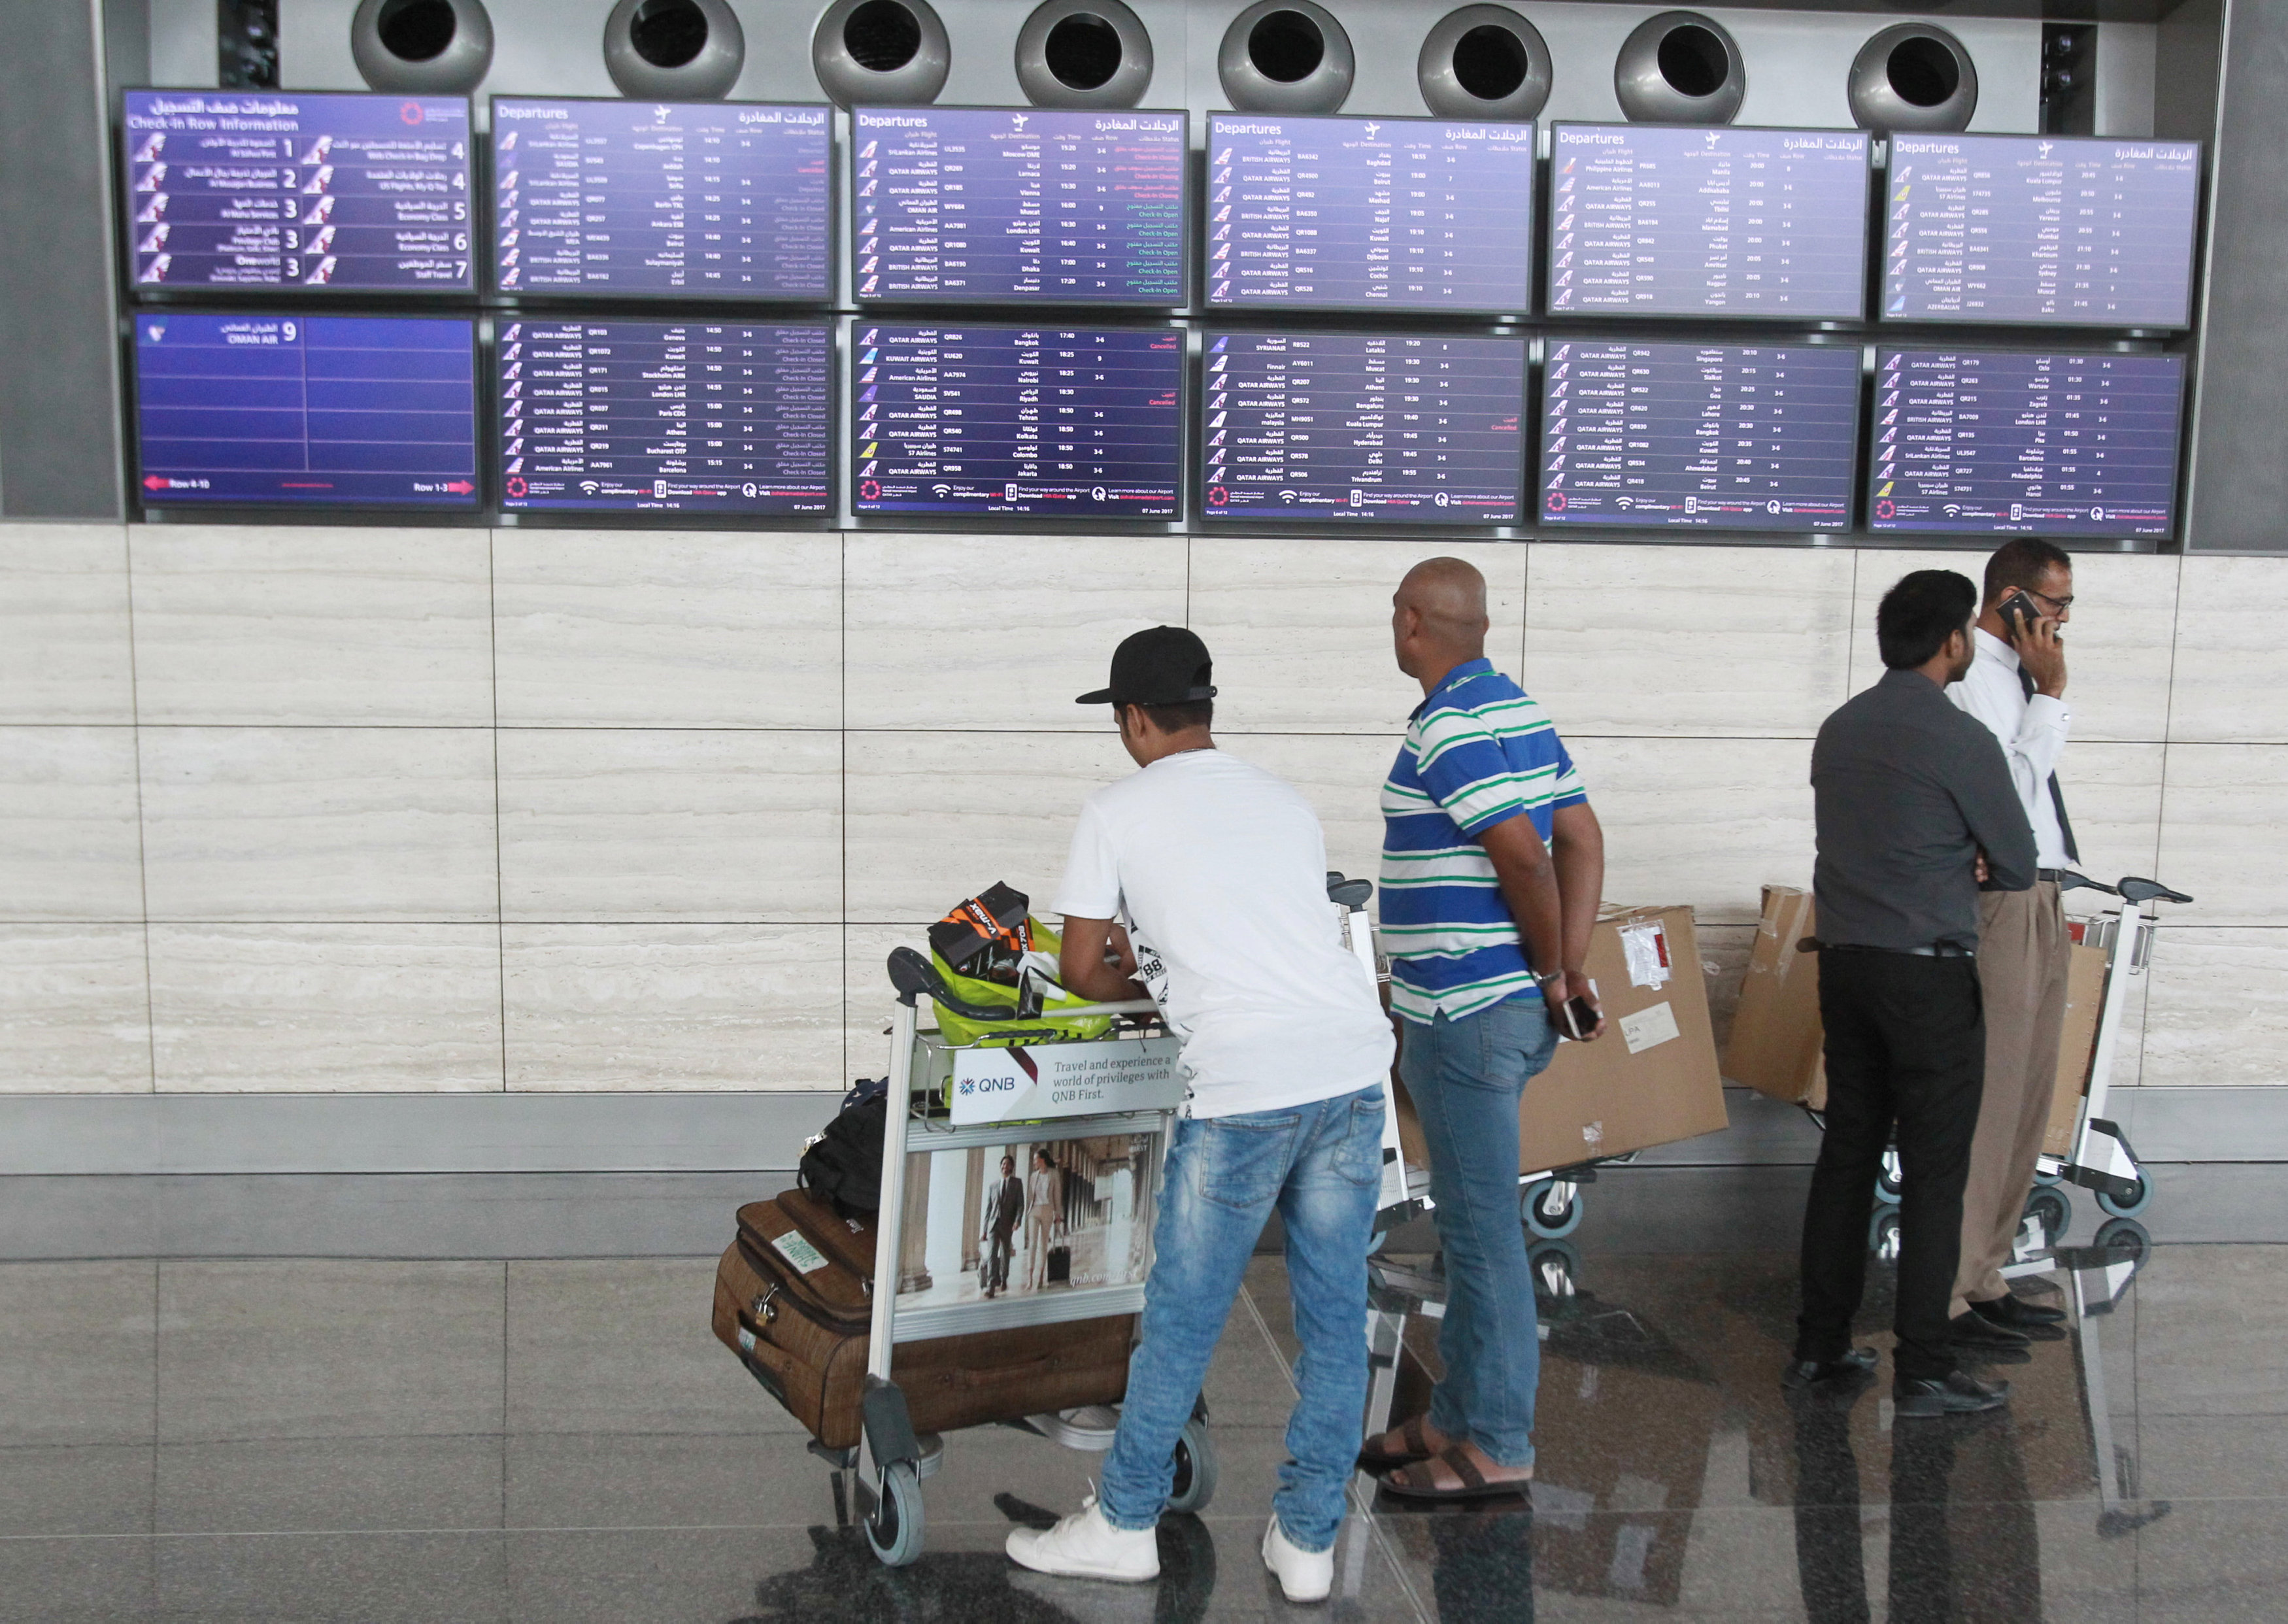 Passengers look at flight details at Hamad International Airport in Doha, Qatar on June 7, 2017. (REUTERS/Naseem Zeitoon)